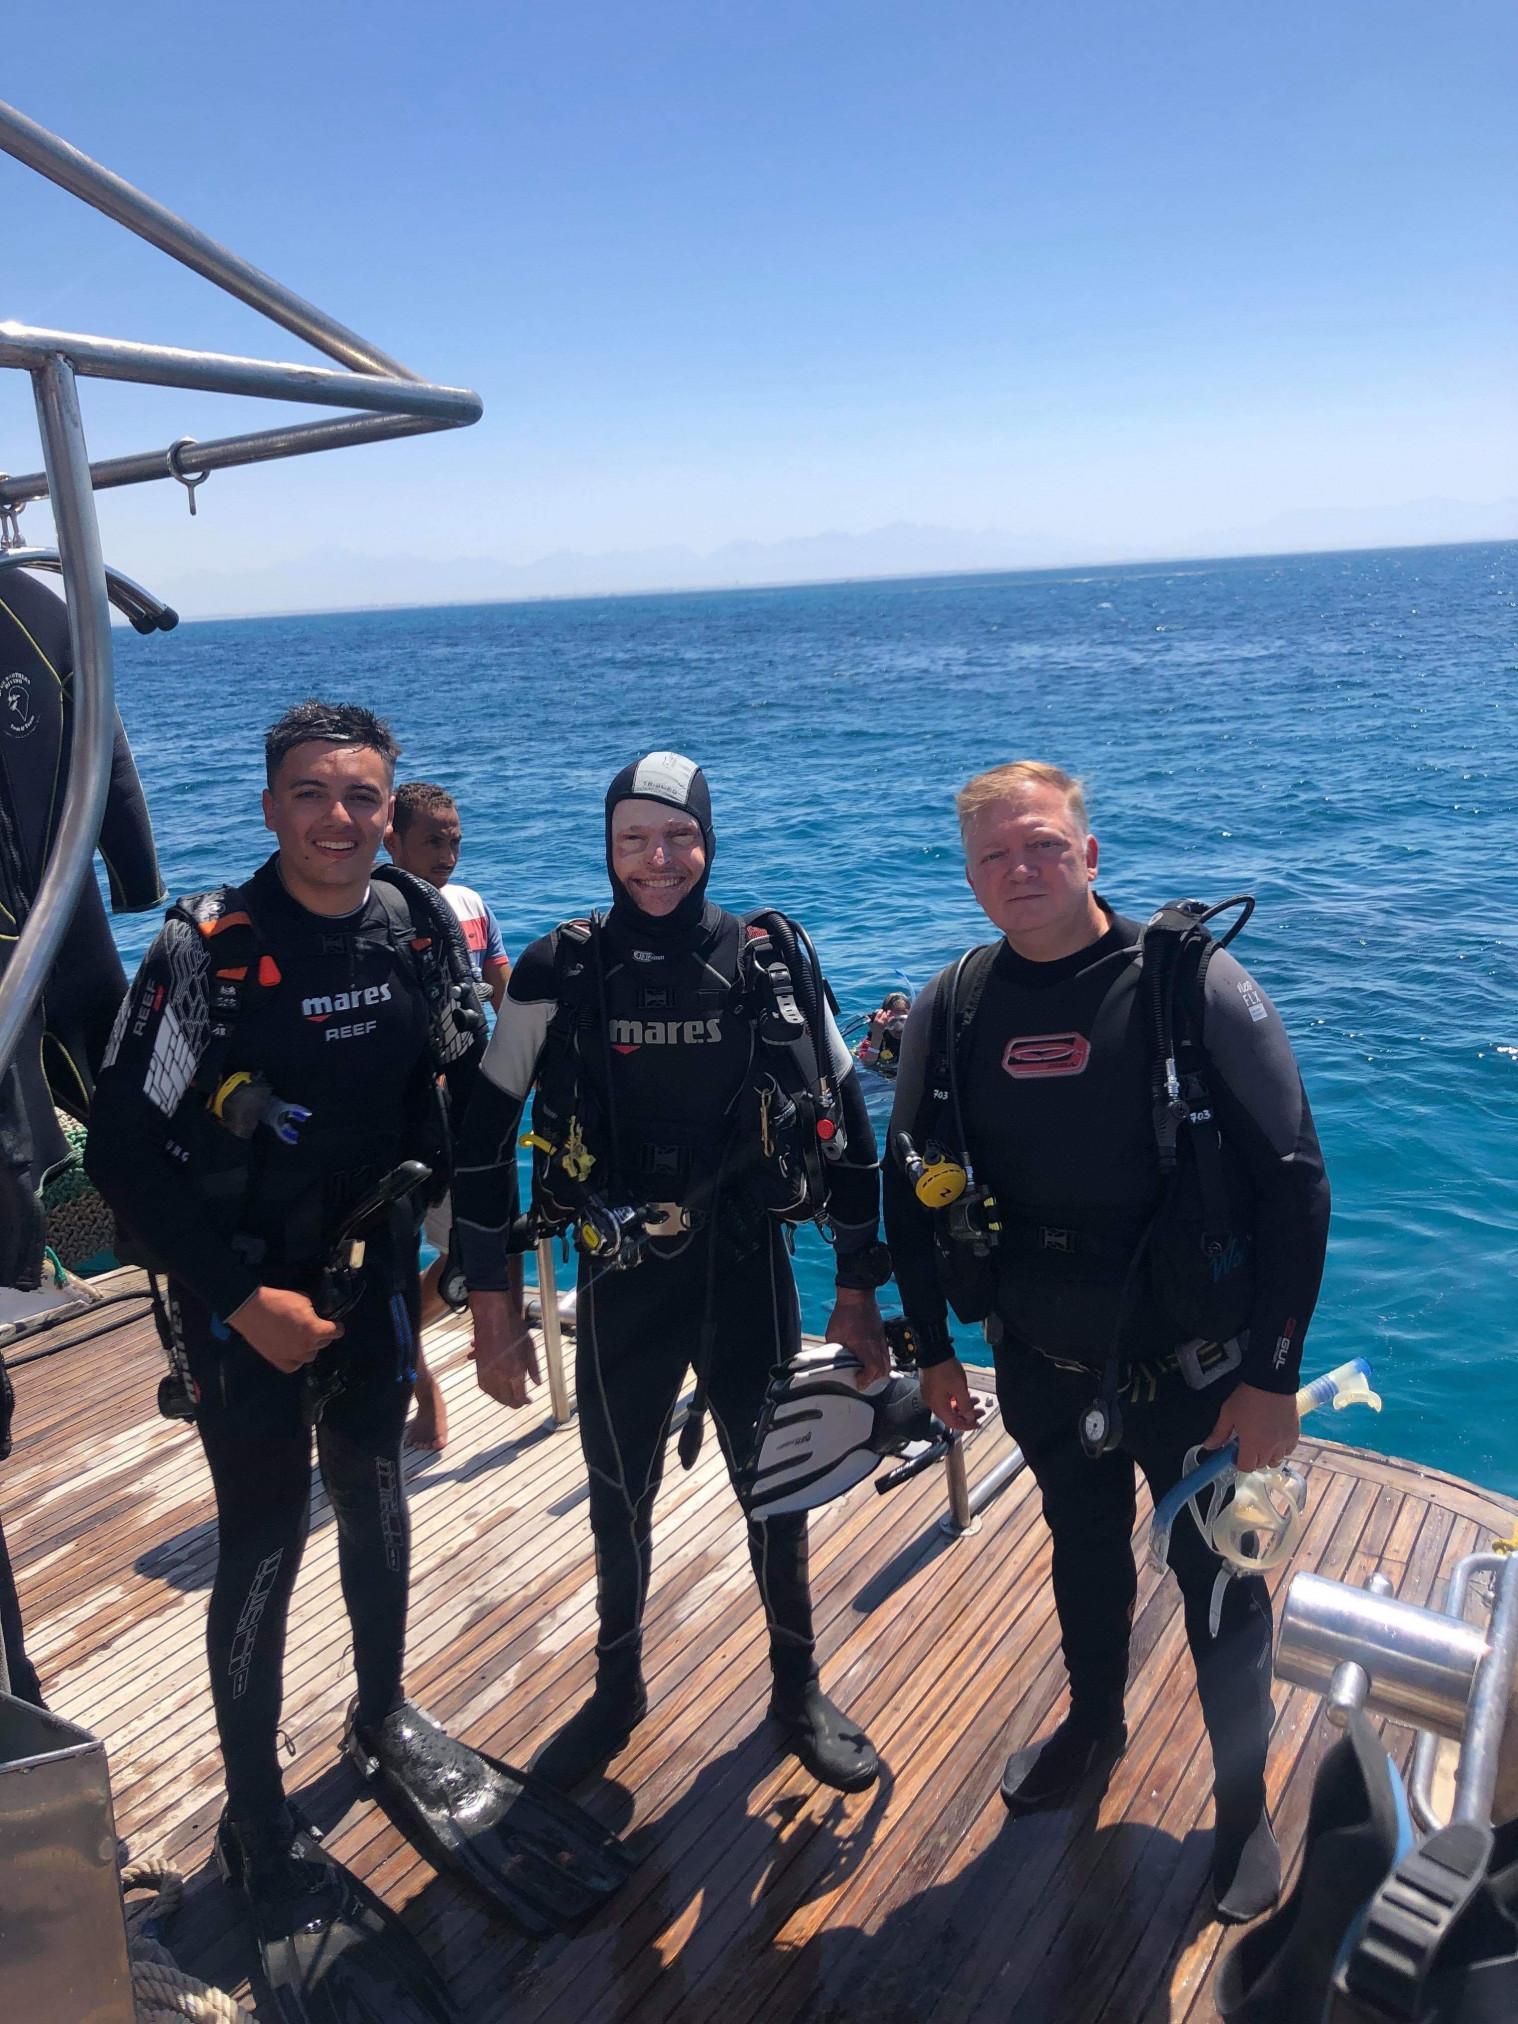 Jamie Hull wearing a diving suit